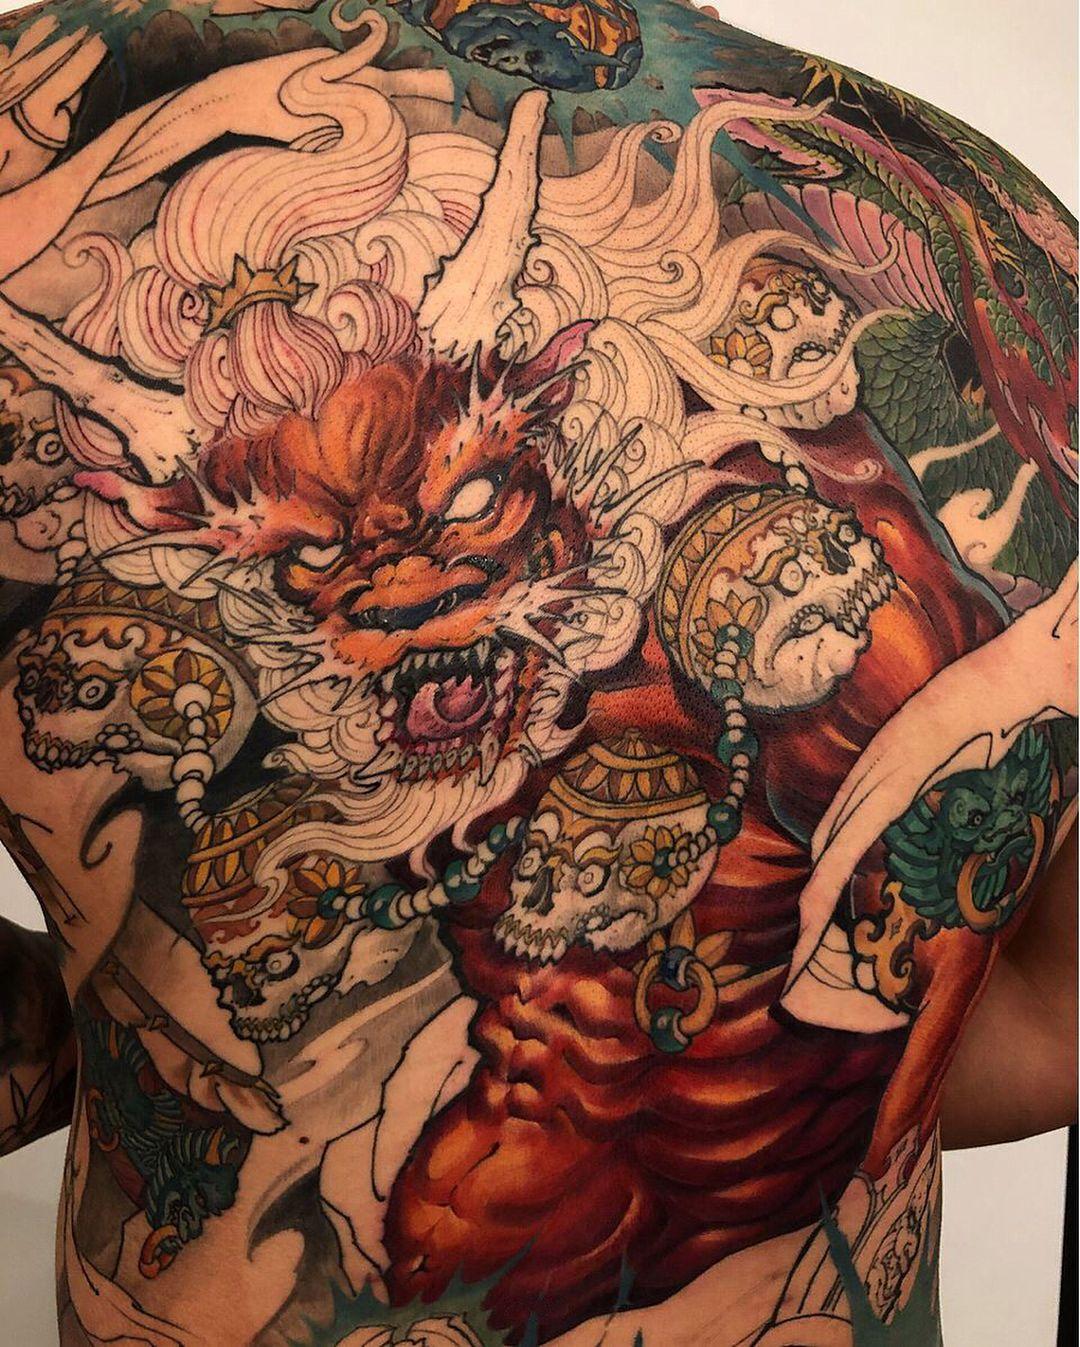 Raijin and dragon back piece inprogress by tonyhu